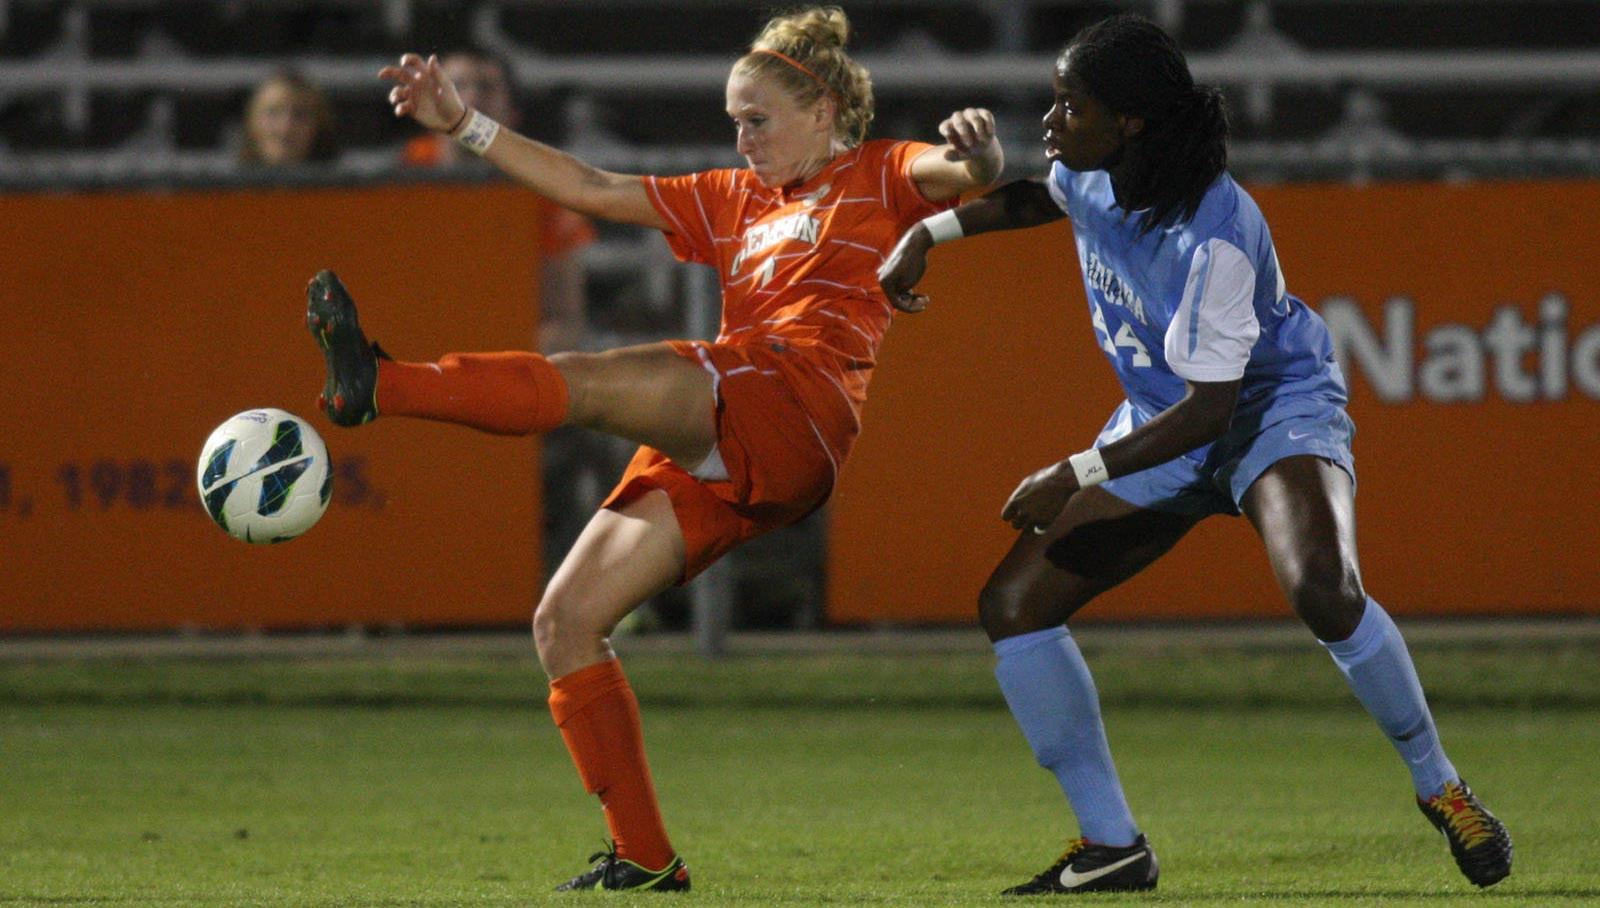 Clemson Women's Soccer Team Falls to #7 North Carolina Friday at Historic Riggs Field